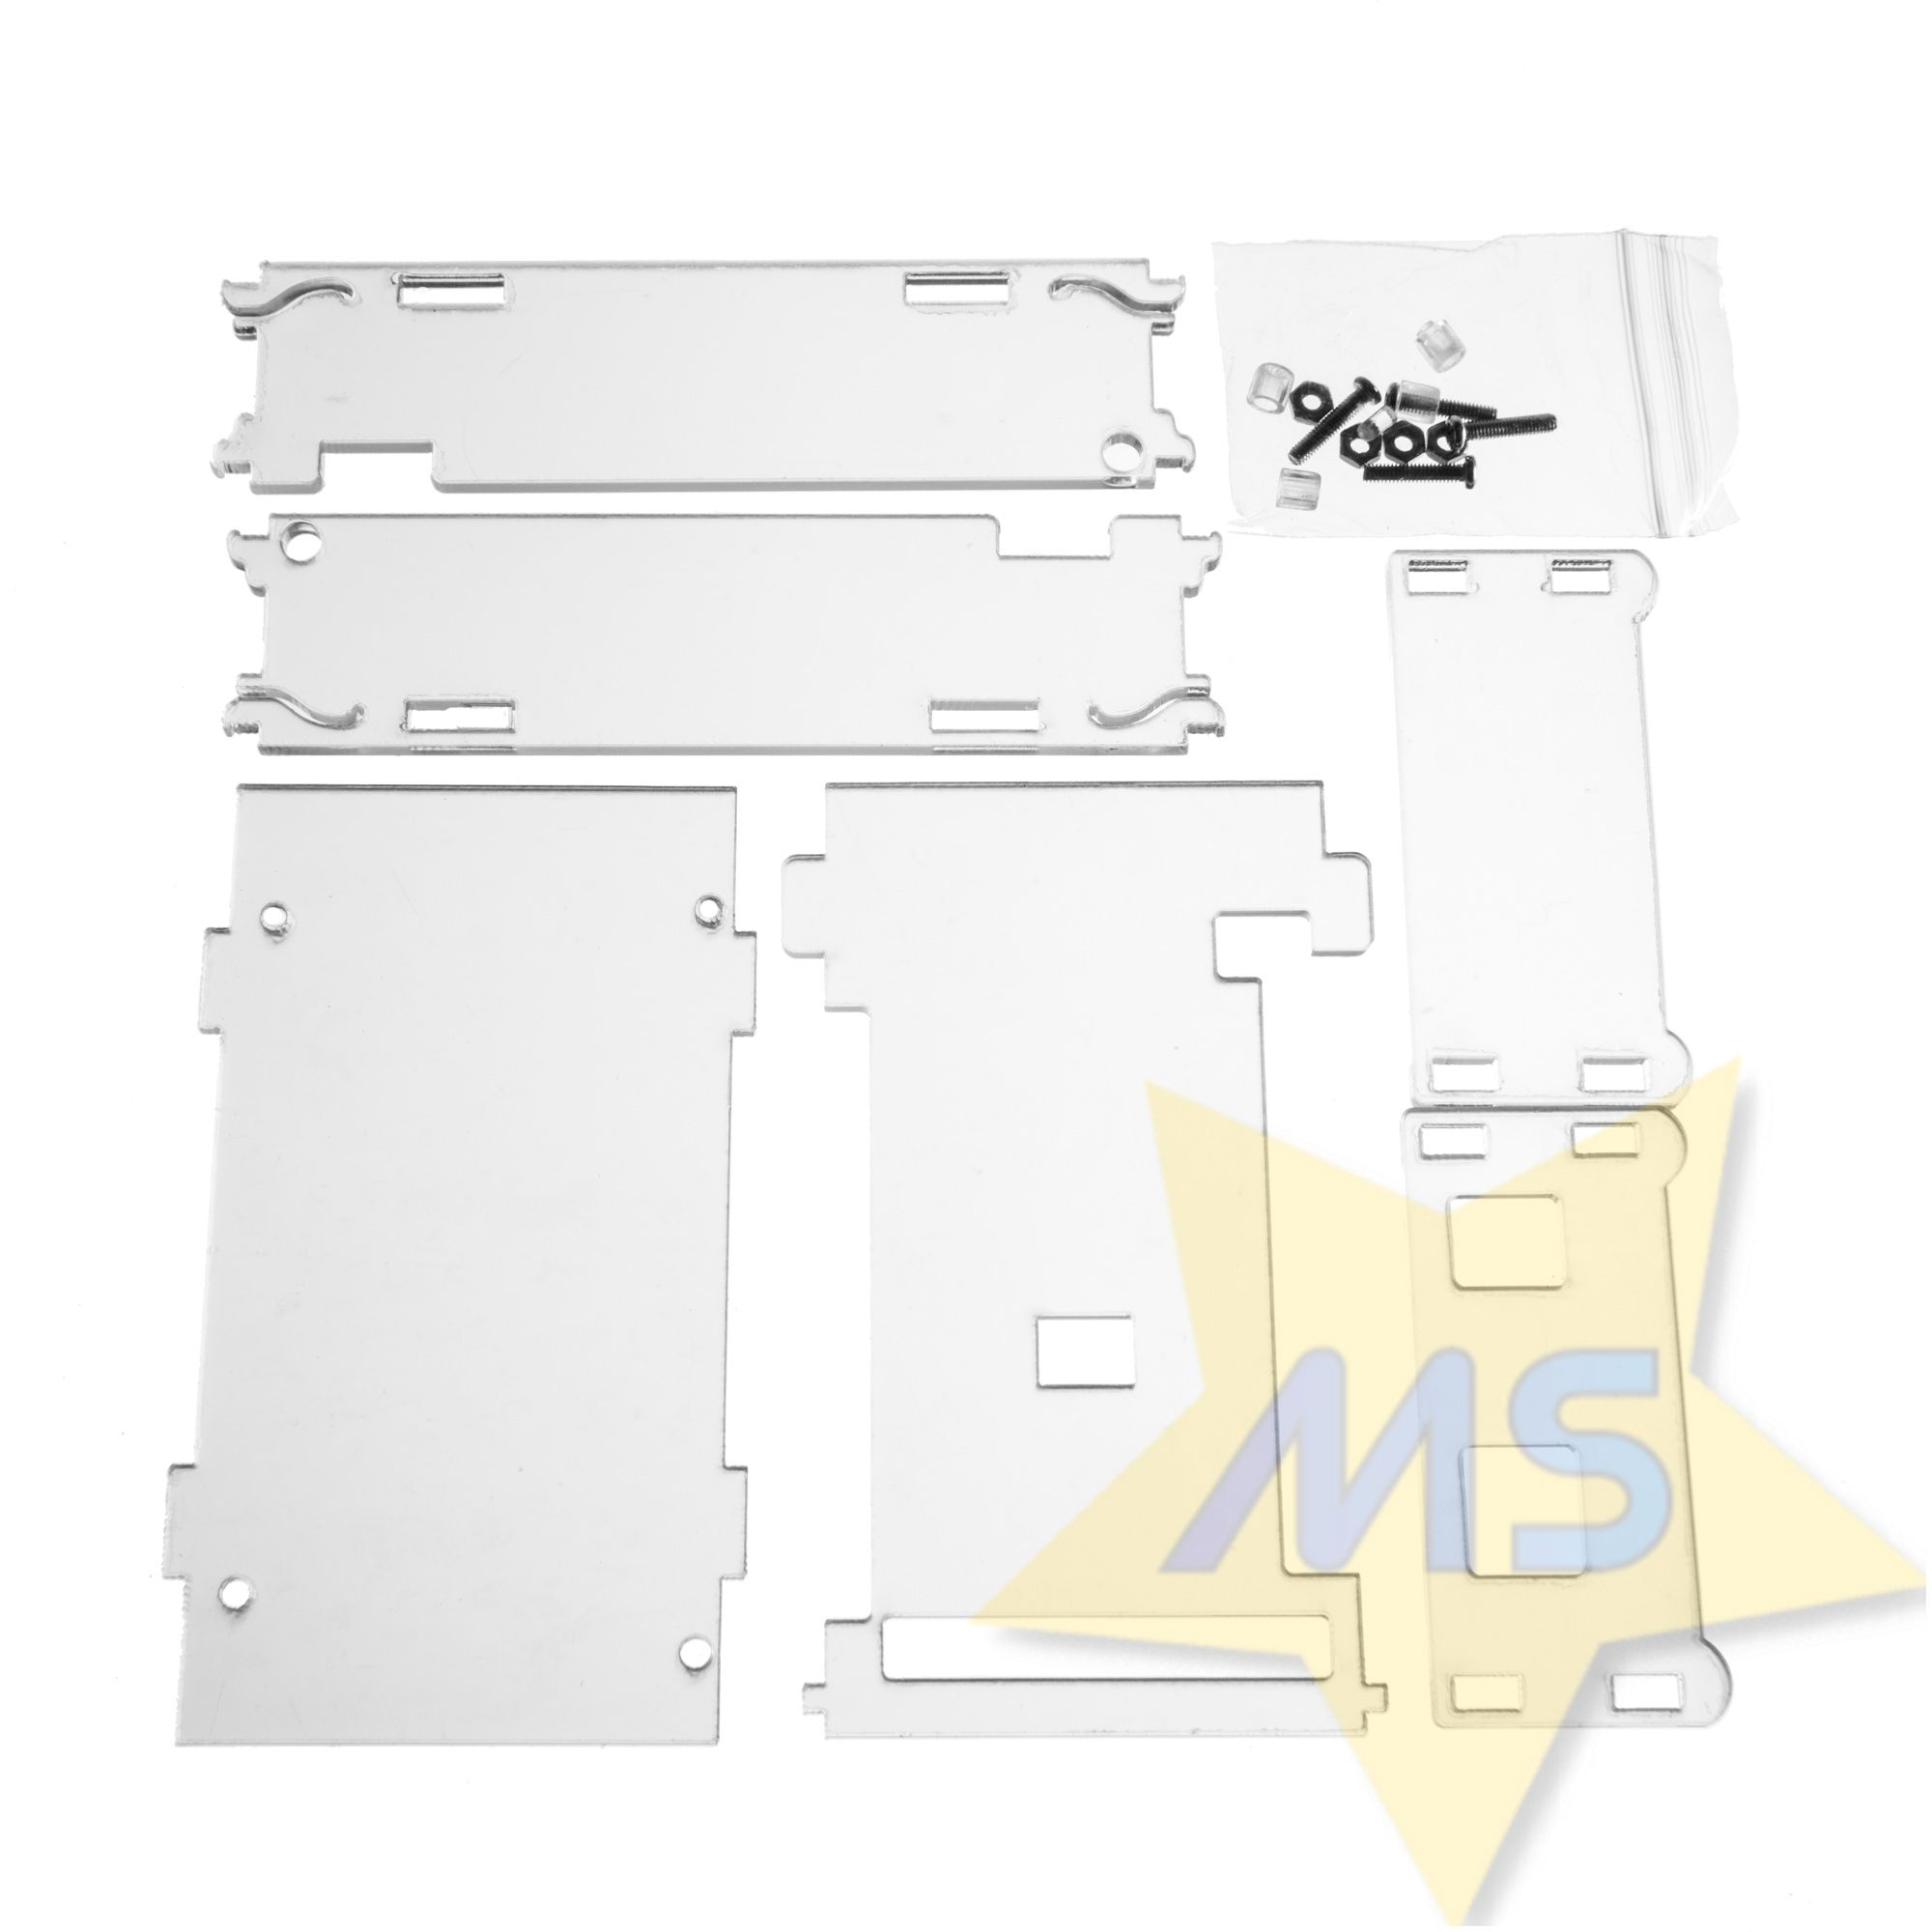 Case de Acrílico transparente Arduino Mega s/ parafuso